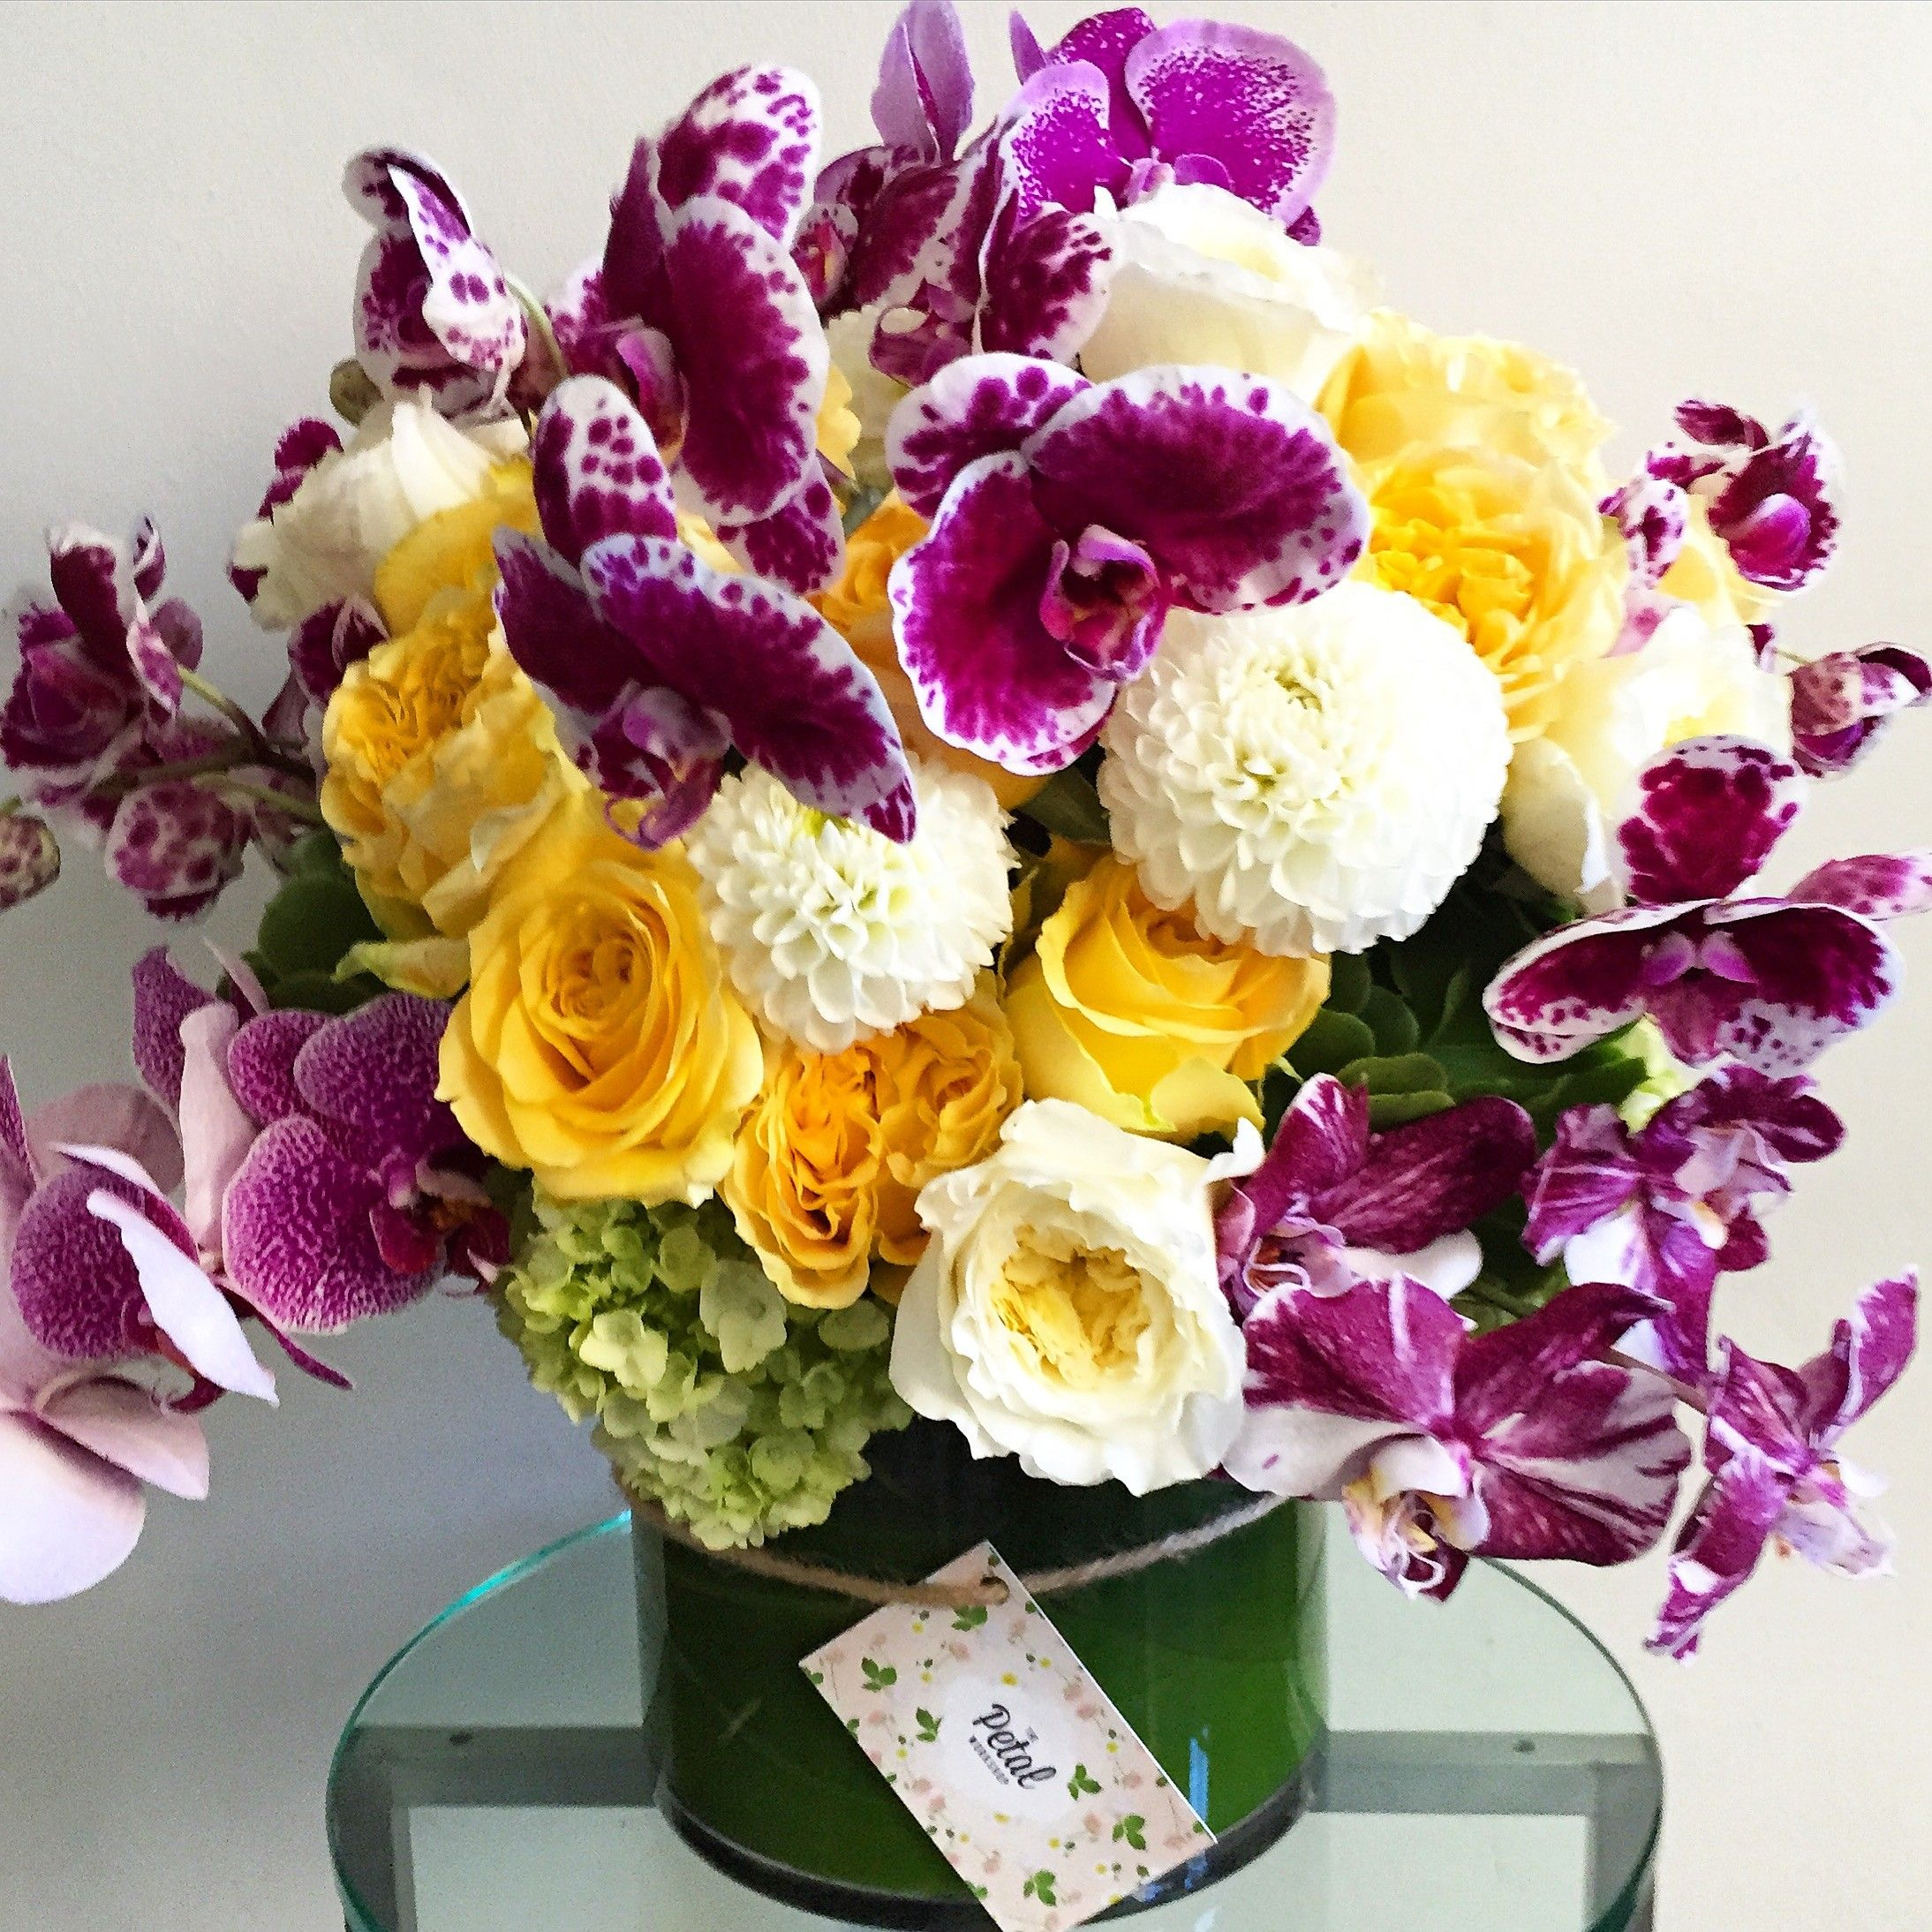 Send The Happy Birthday Arrangement. in Los Angeles, CA